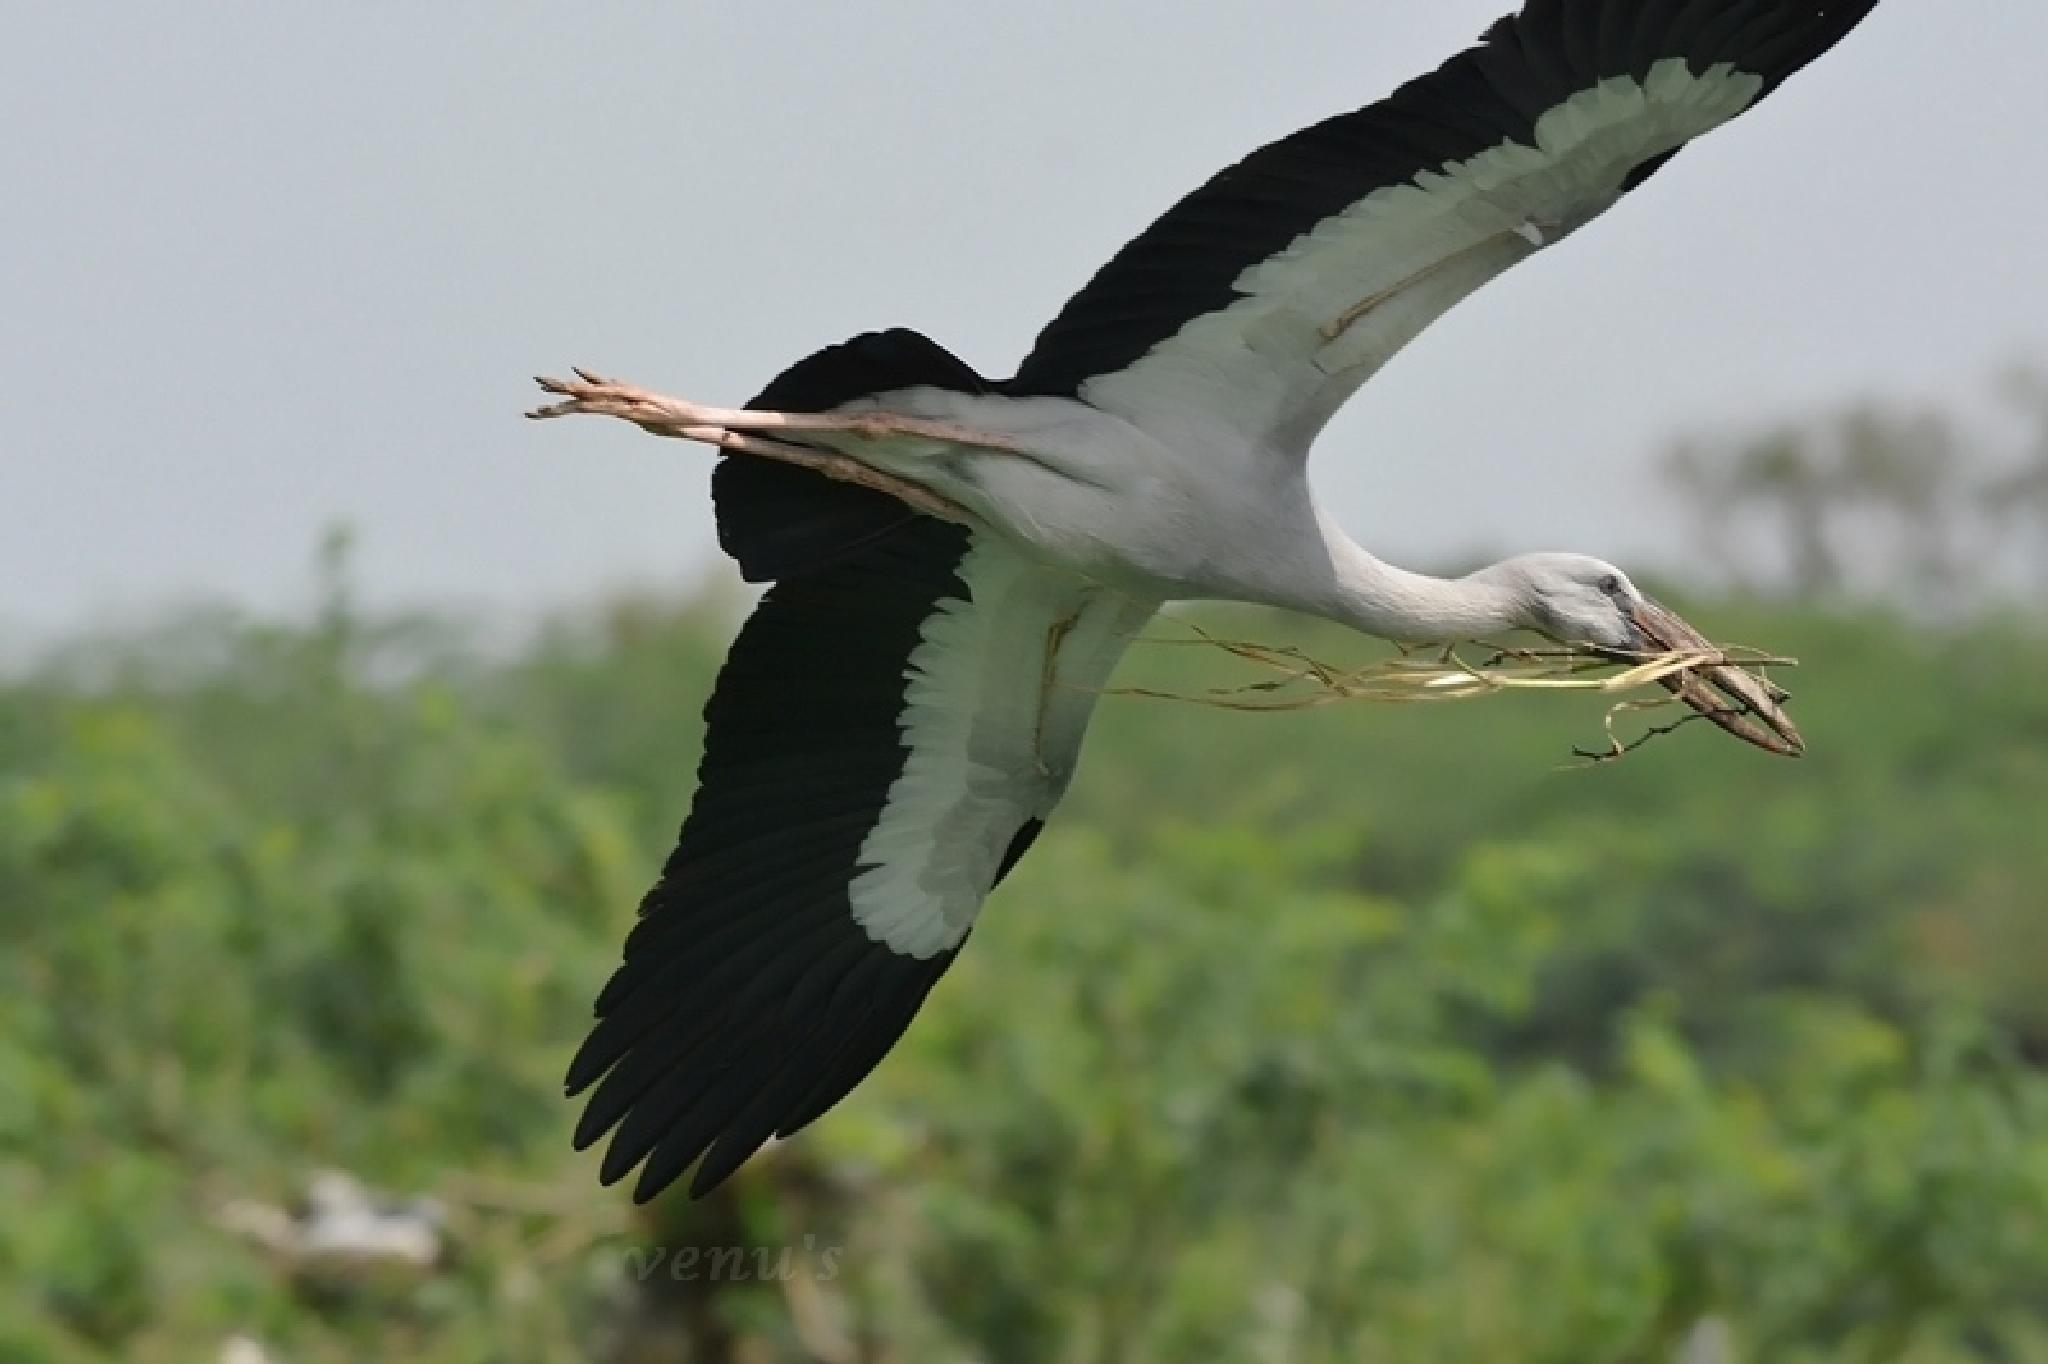 Open bill Stork by venugopalbsnl